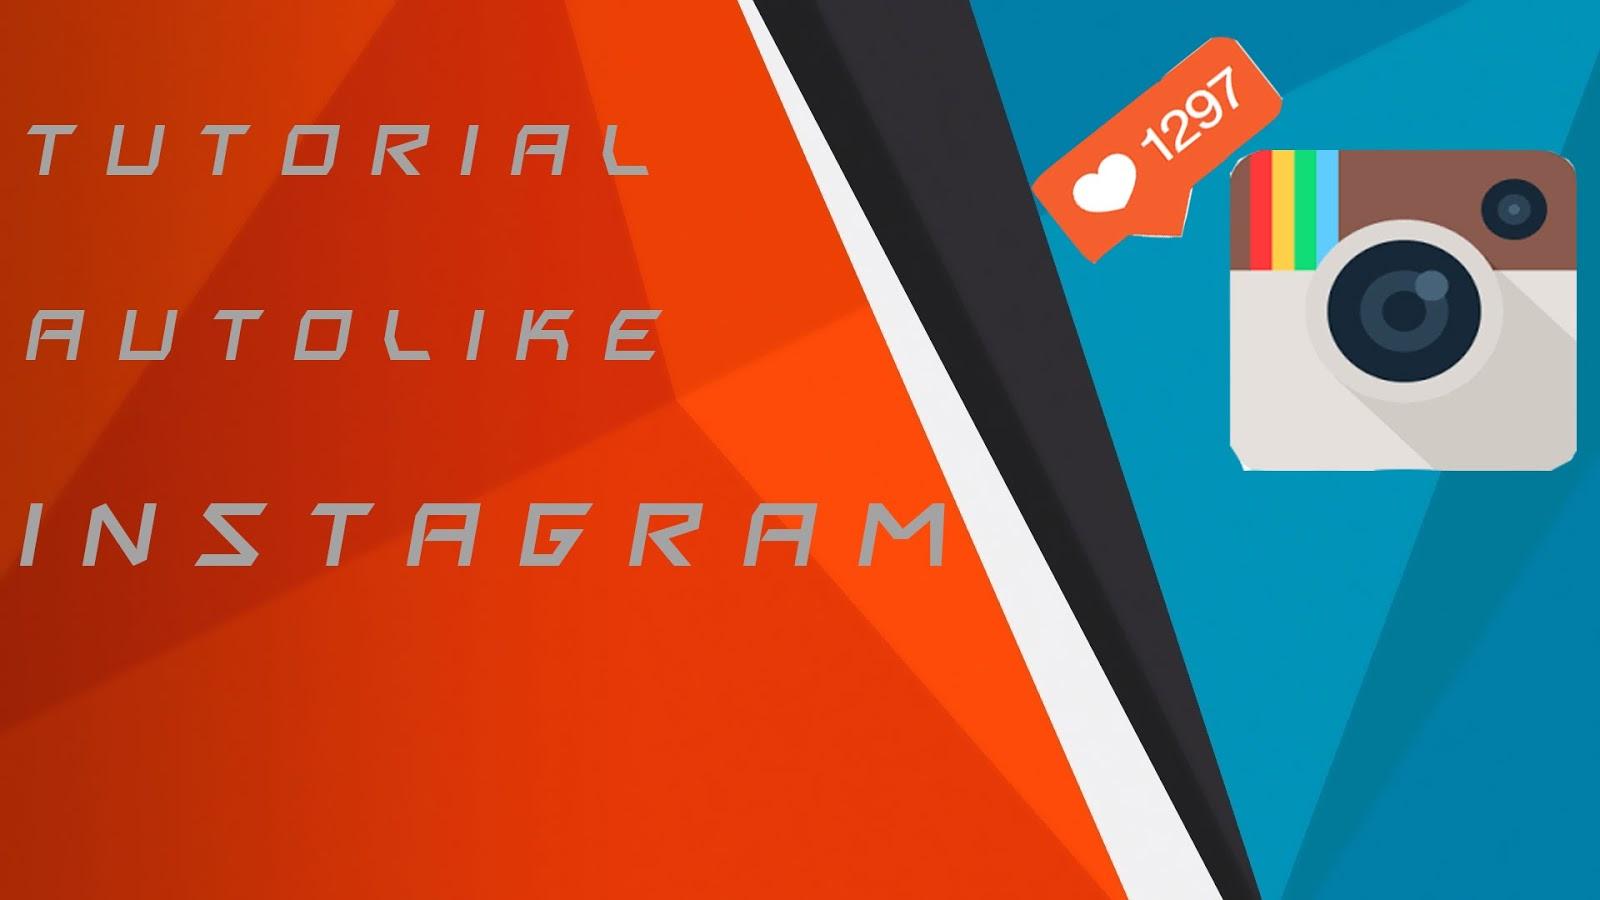 instagram autolike autofollow autocoment autoall sosial media mudah praktis